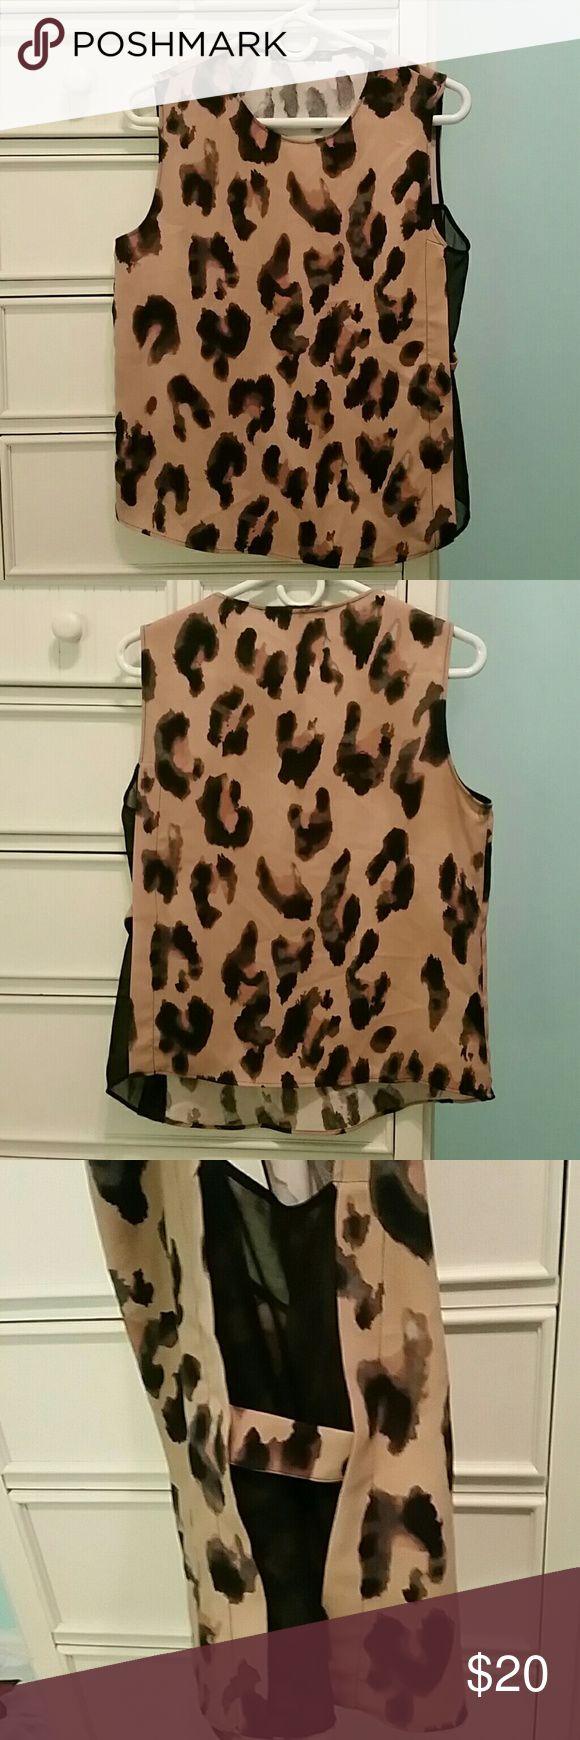 best 25 leopard print shorts ideas on pinterest women u0027s animal